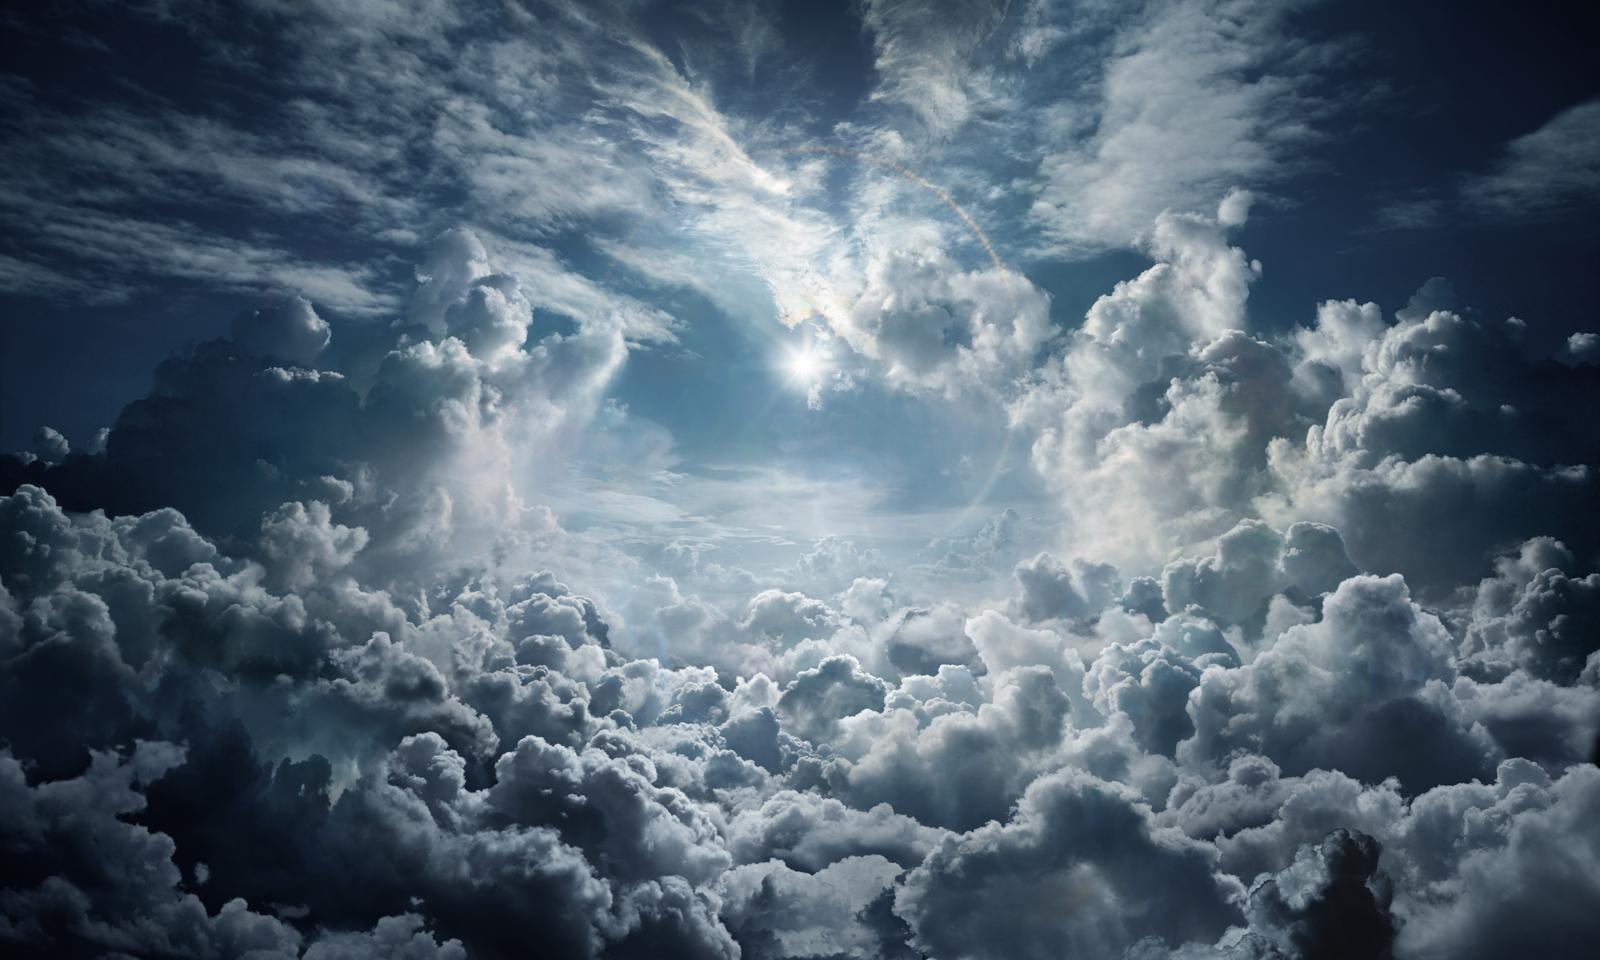 THE_KINGDOML_Sun_above_clouds_2008.jpg (1600×960)